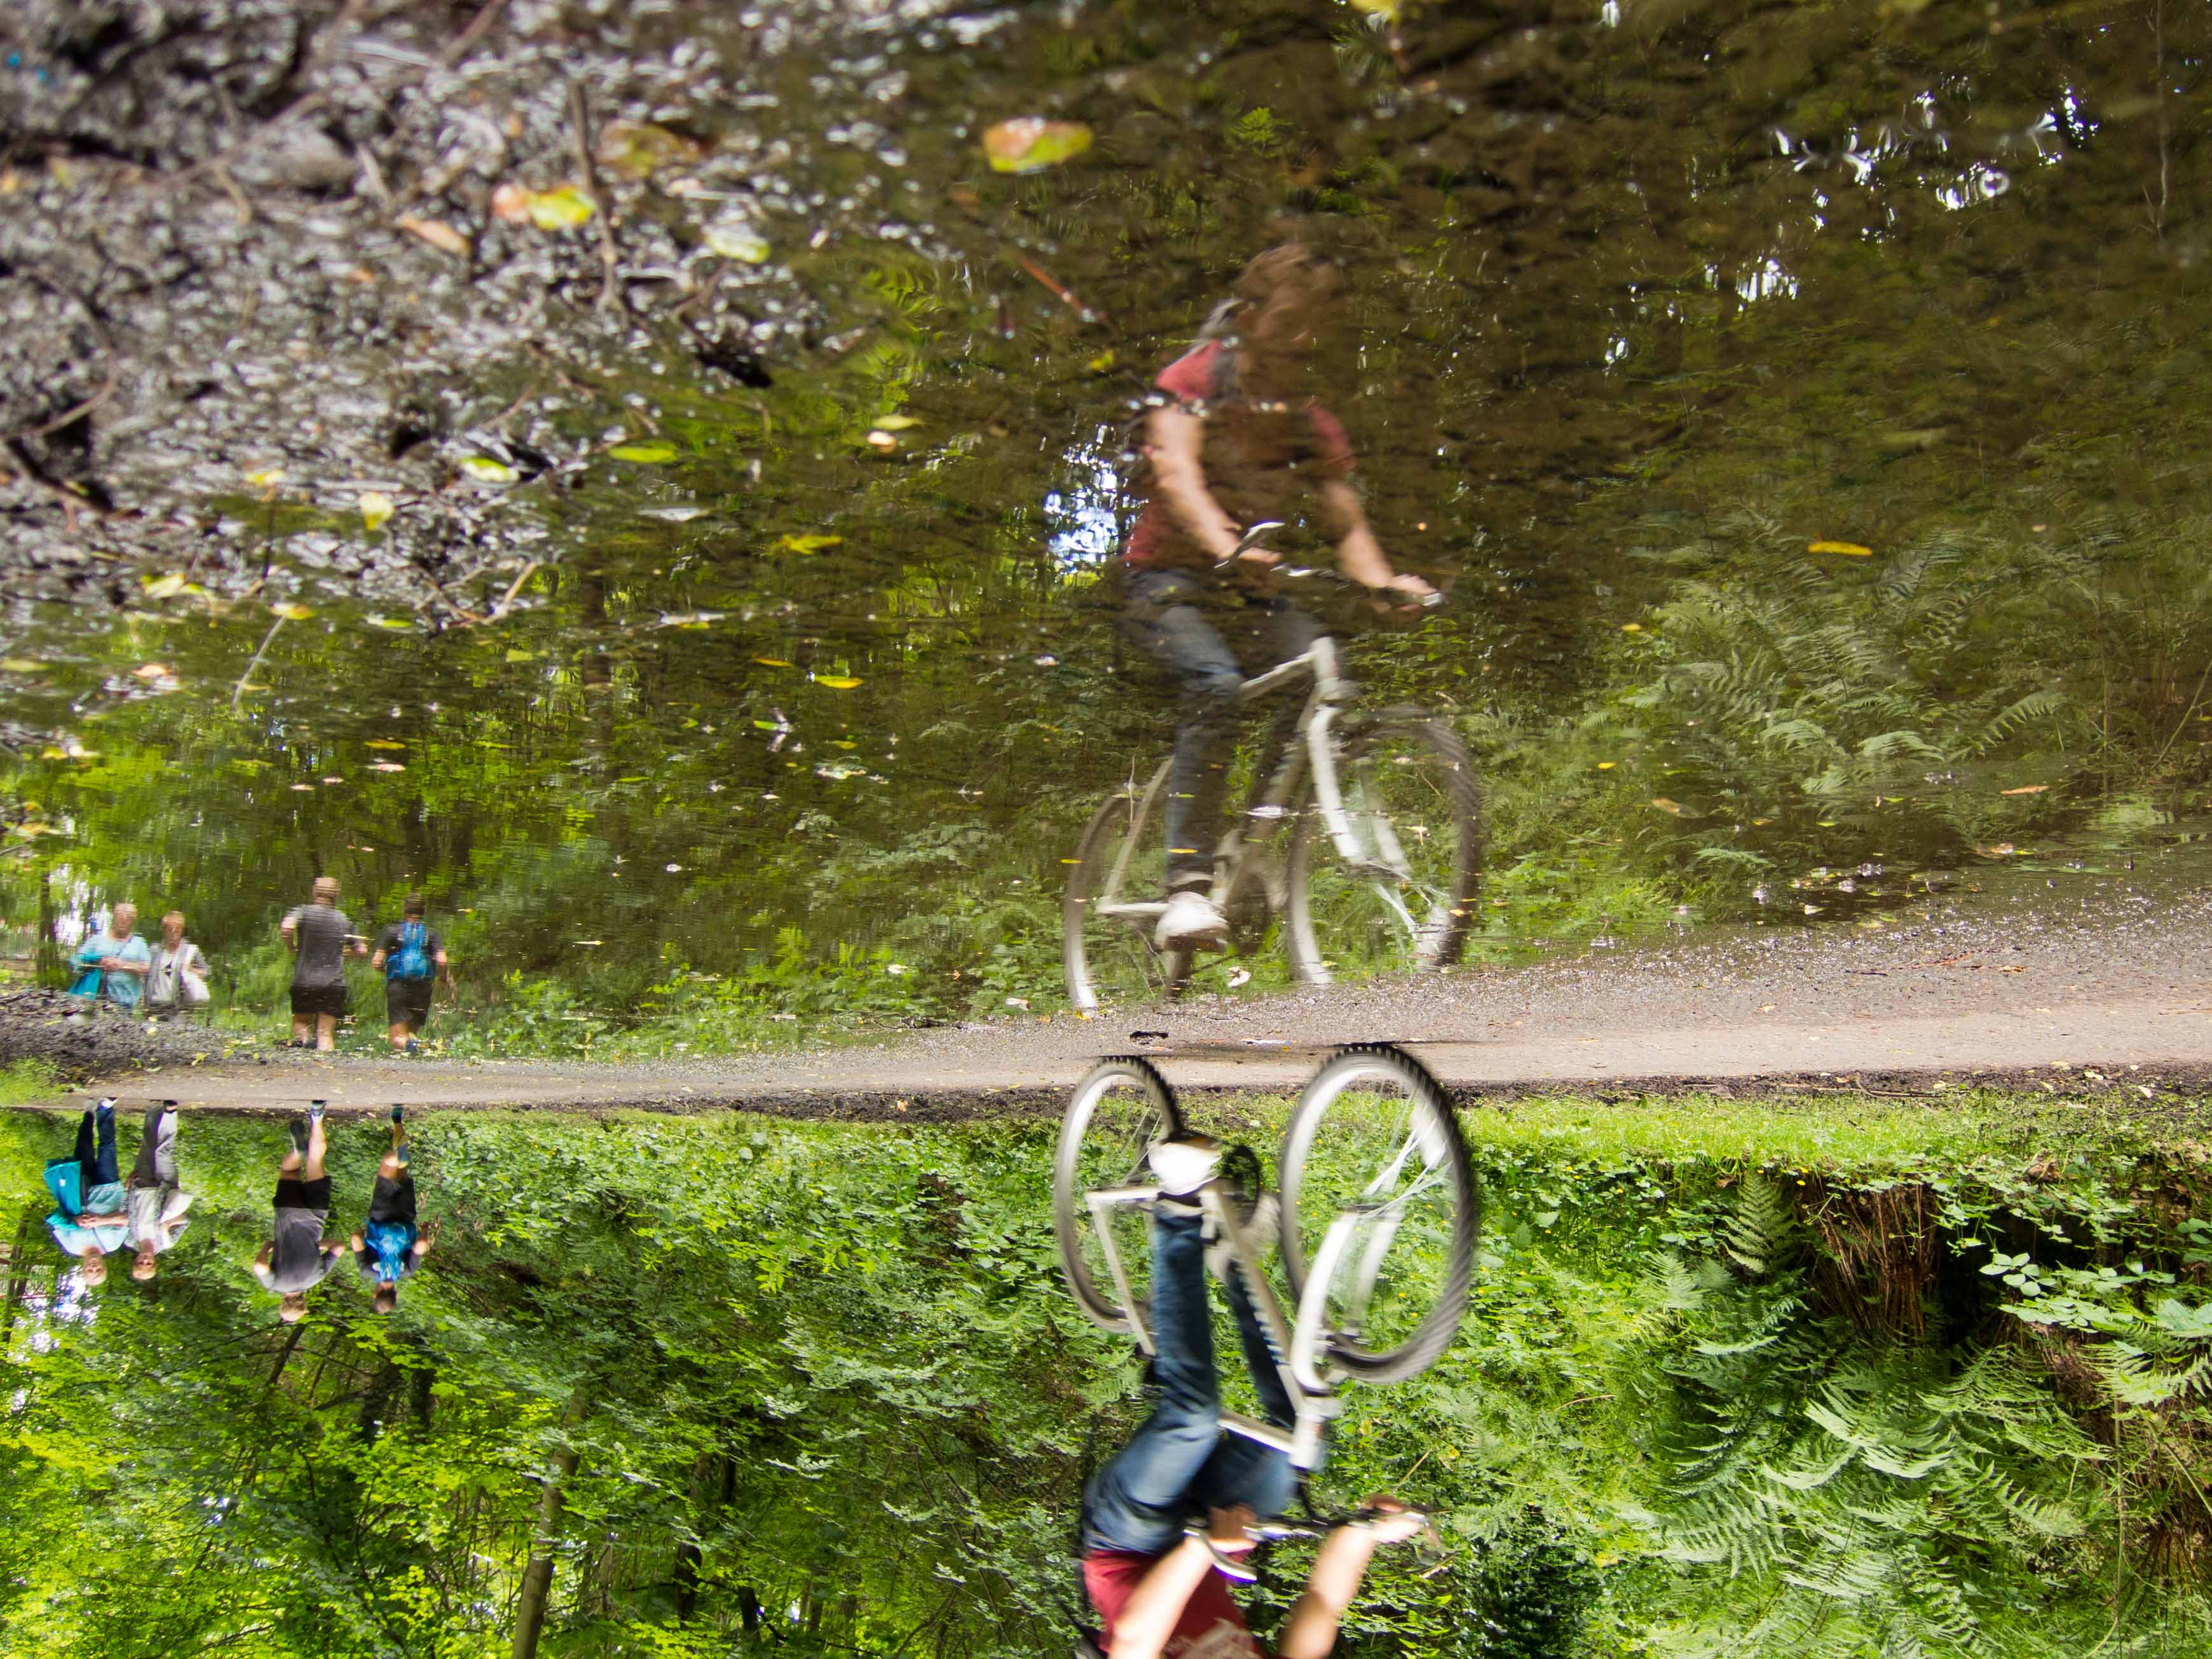 Edinburgh Cycle Network